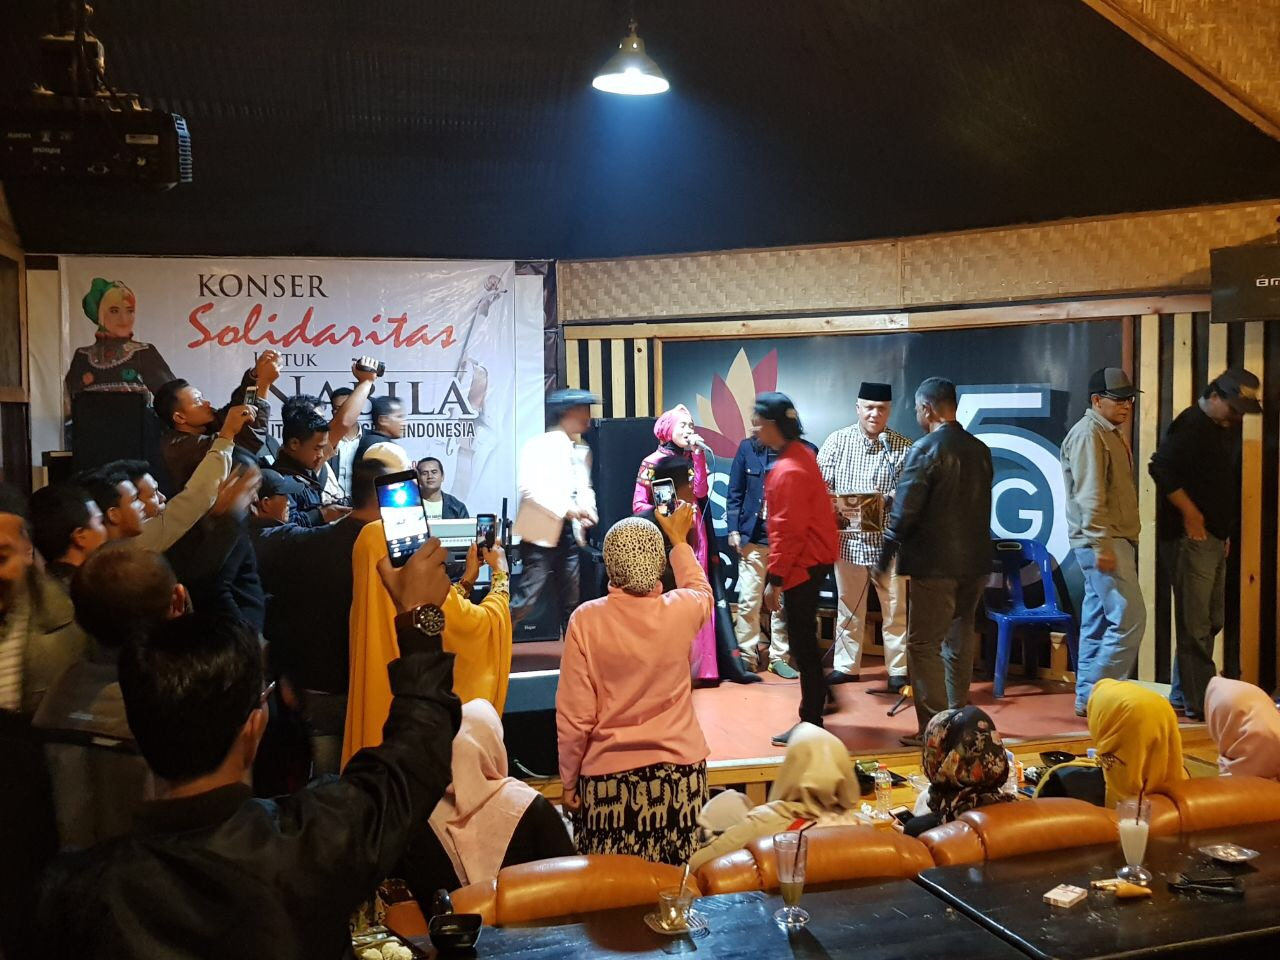 Pilih Posisi Cawagub, Dedi Mulyadi: Bukan Menerima Tetapi Saya Meminta